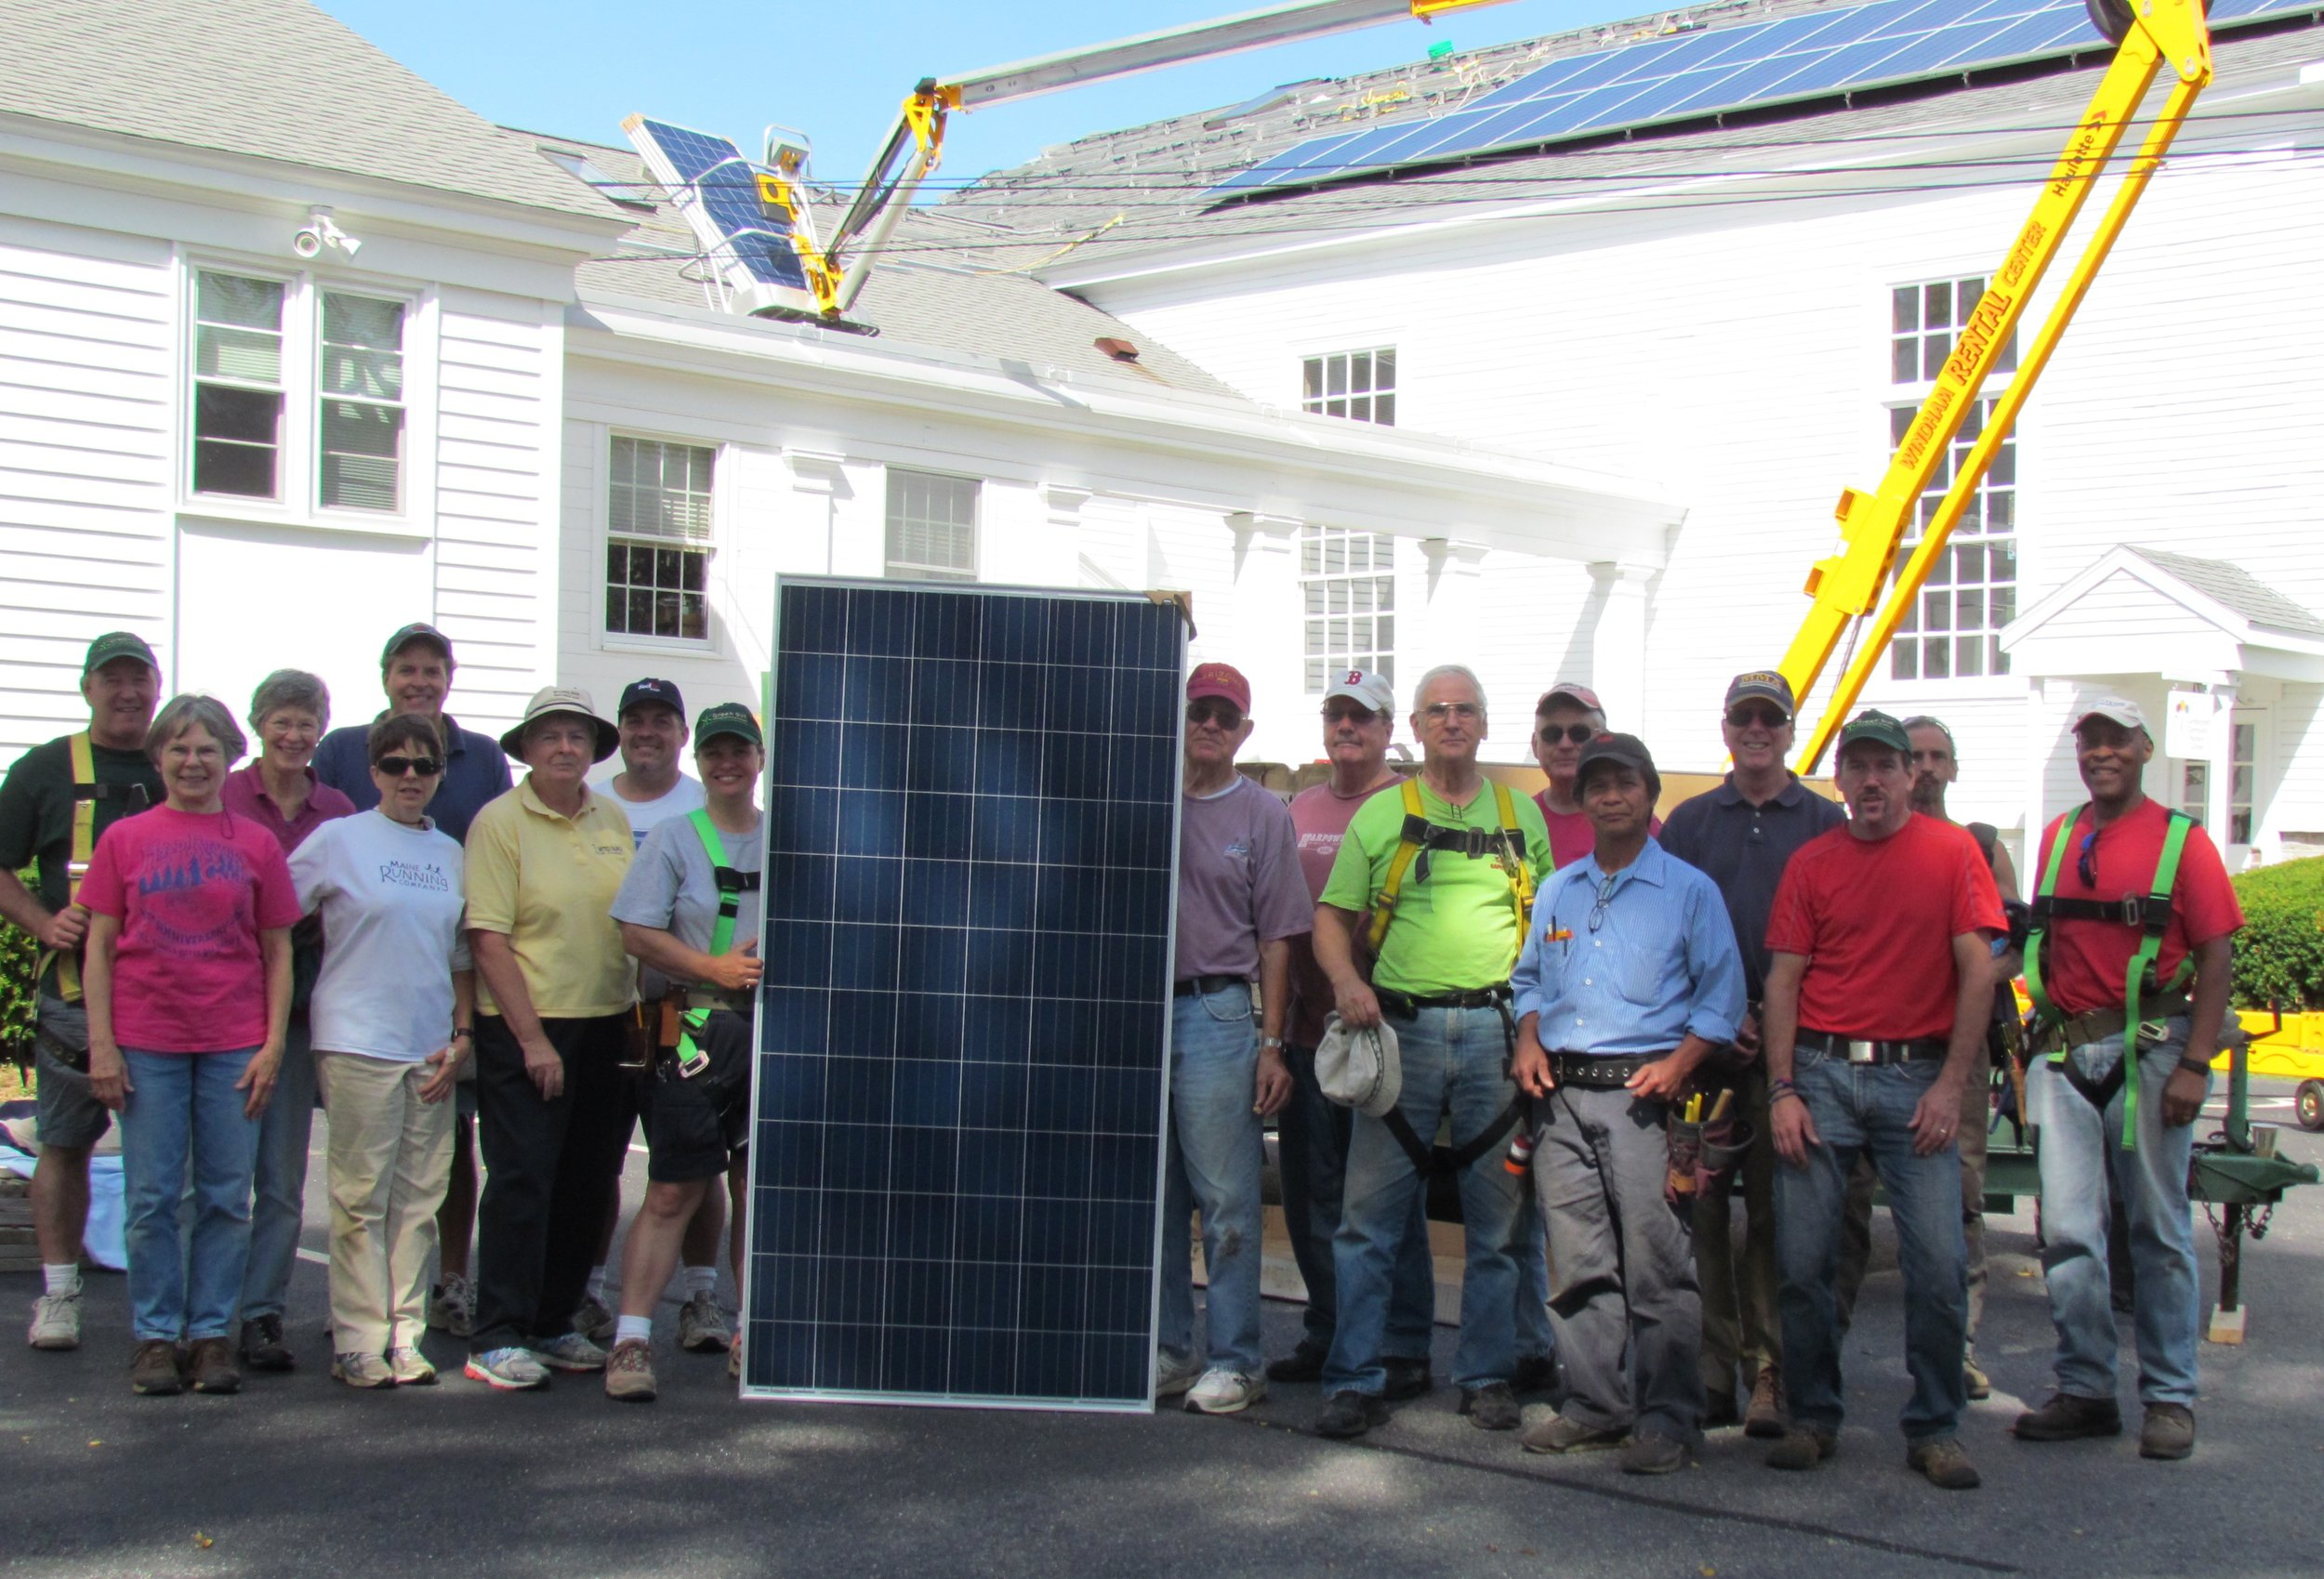 Cumberland_UCC_solar_panels.jpg